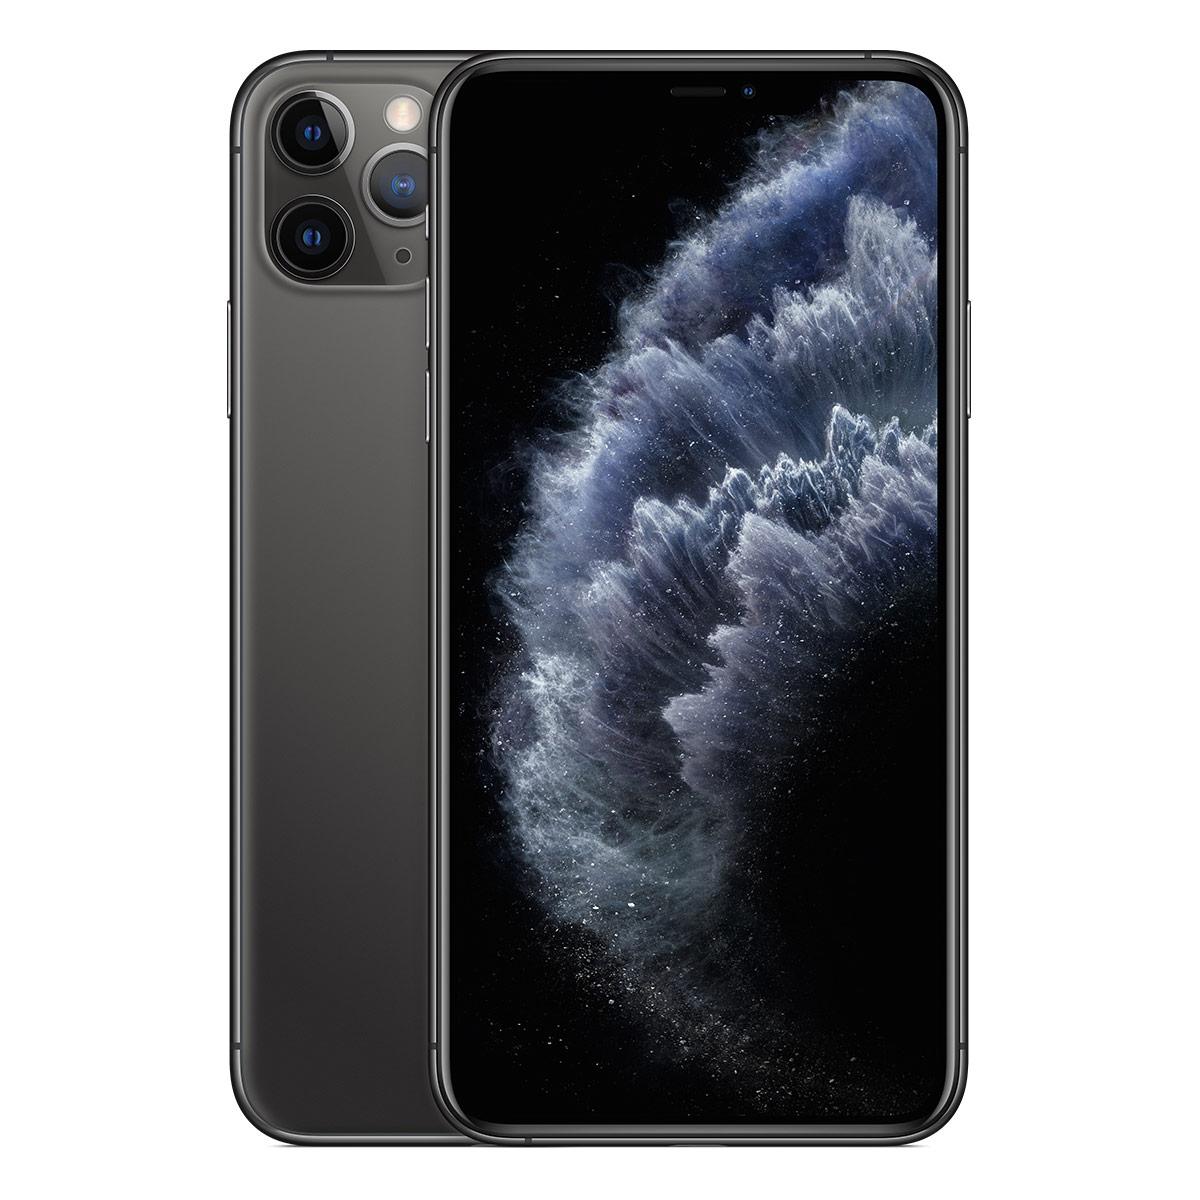 Apple iPhone 11 Pro Max 512GB Space Grey - Unlocked